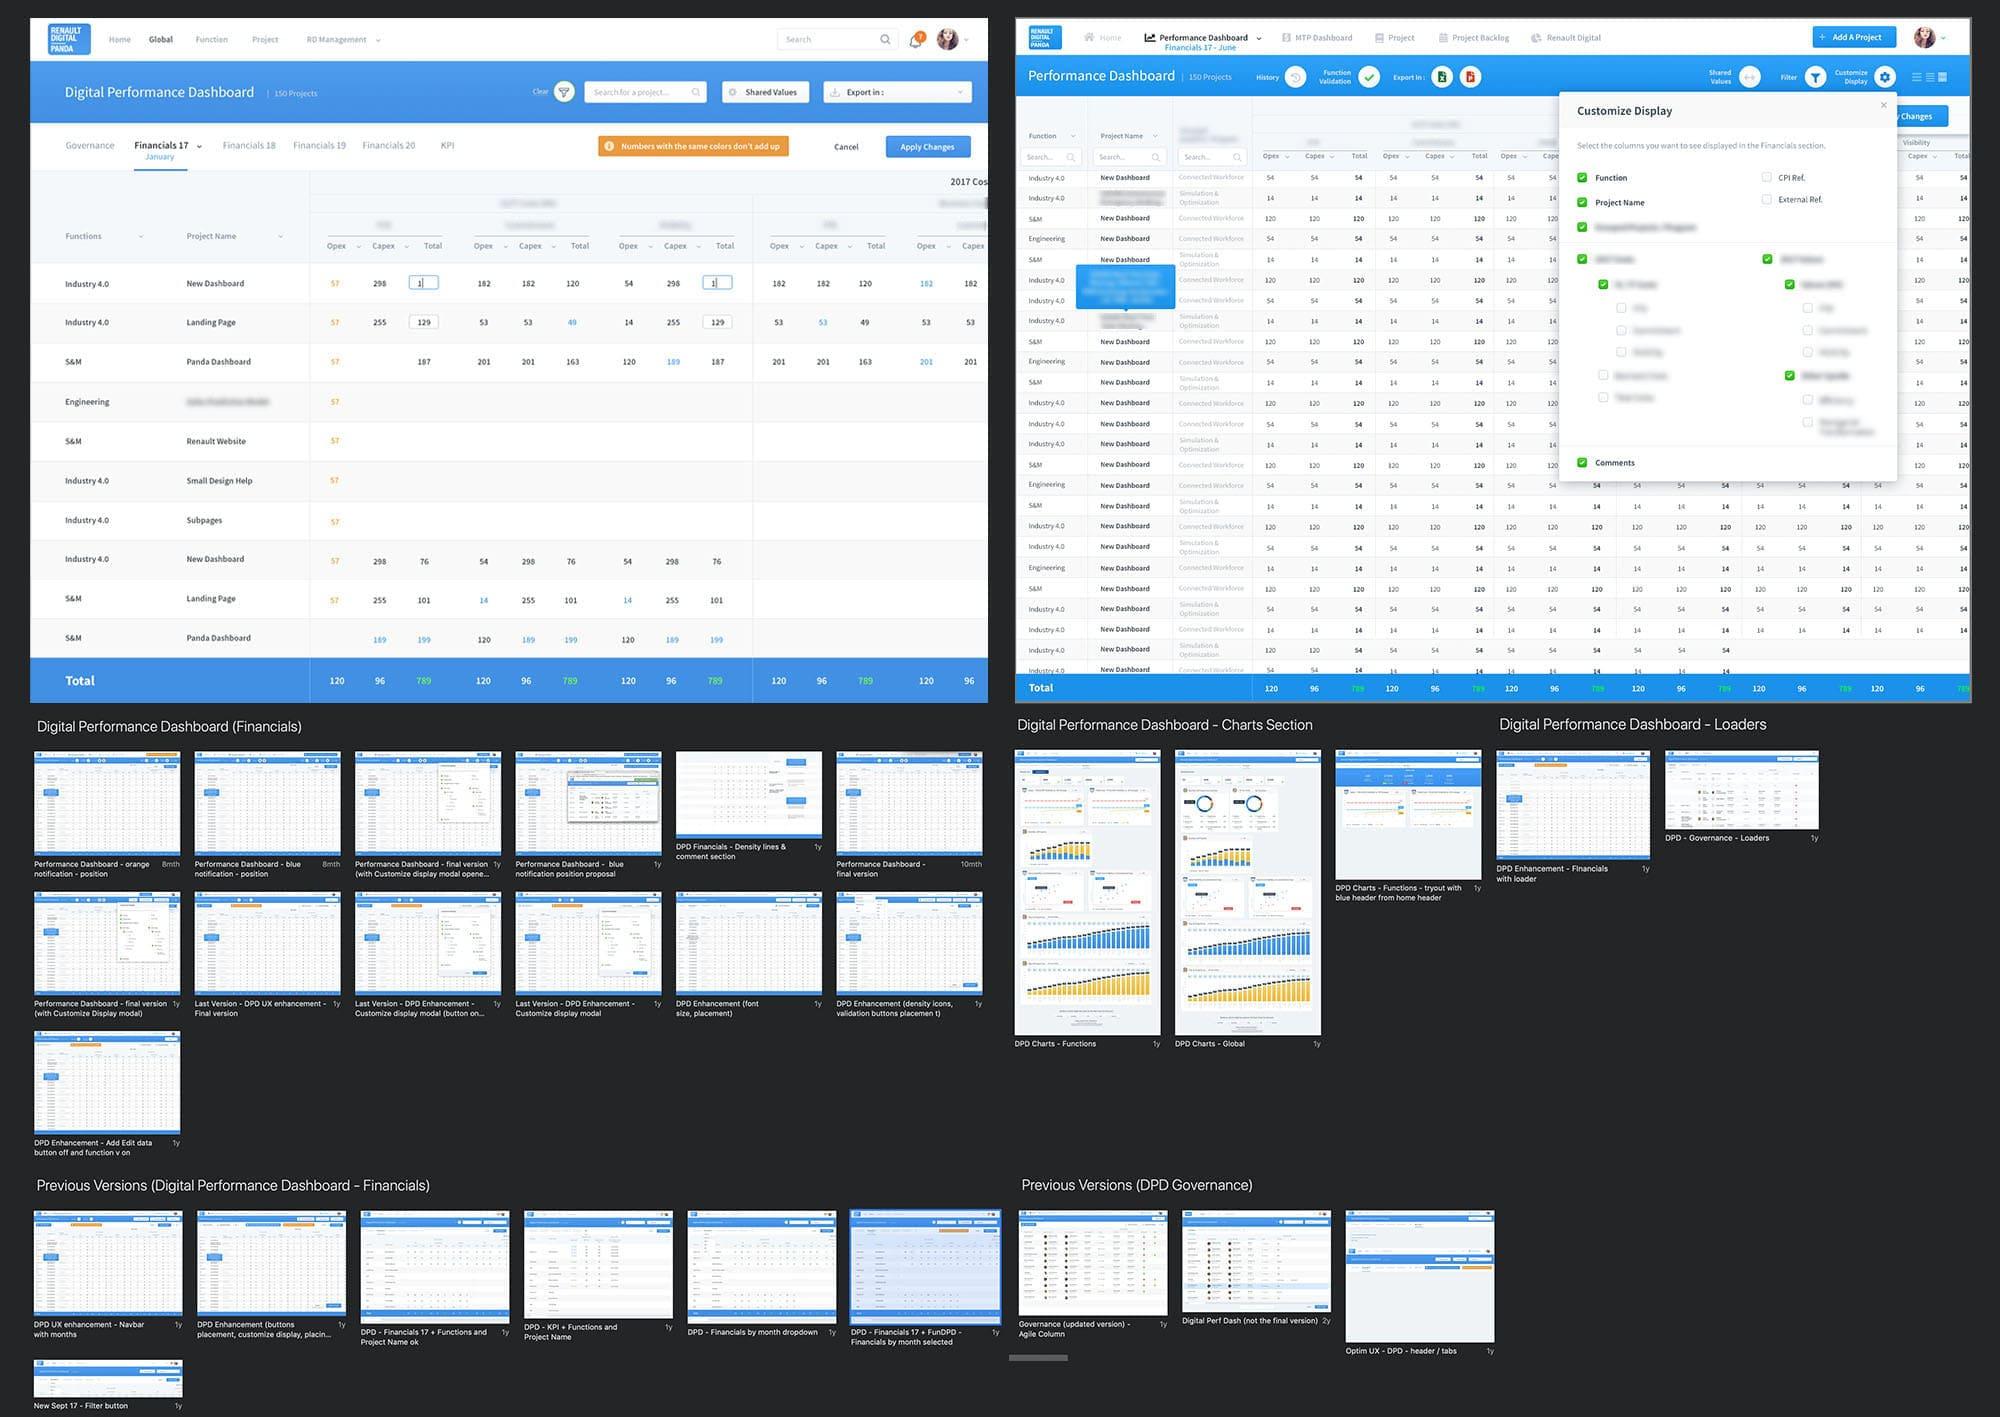 Panda-dashboard-final-designs-DPD